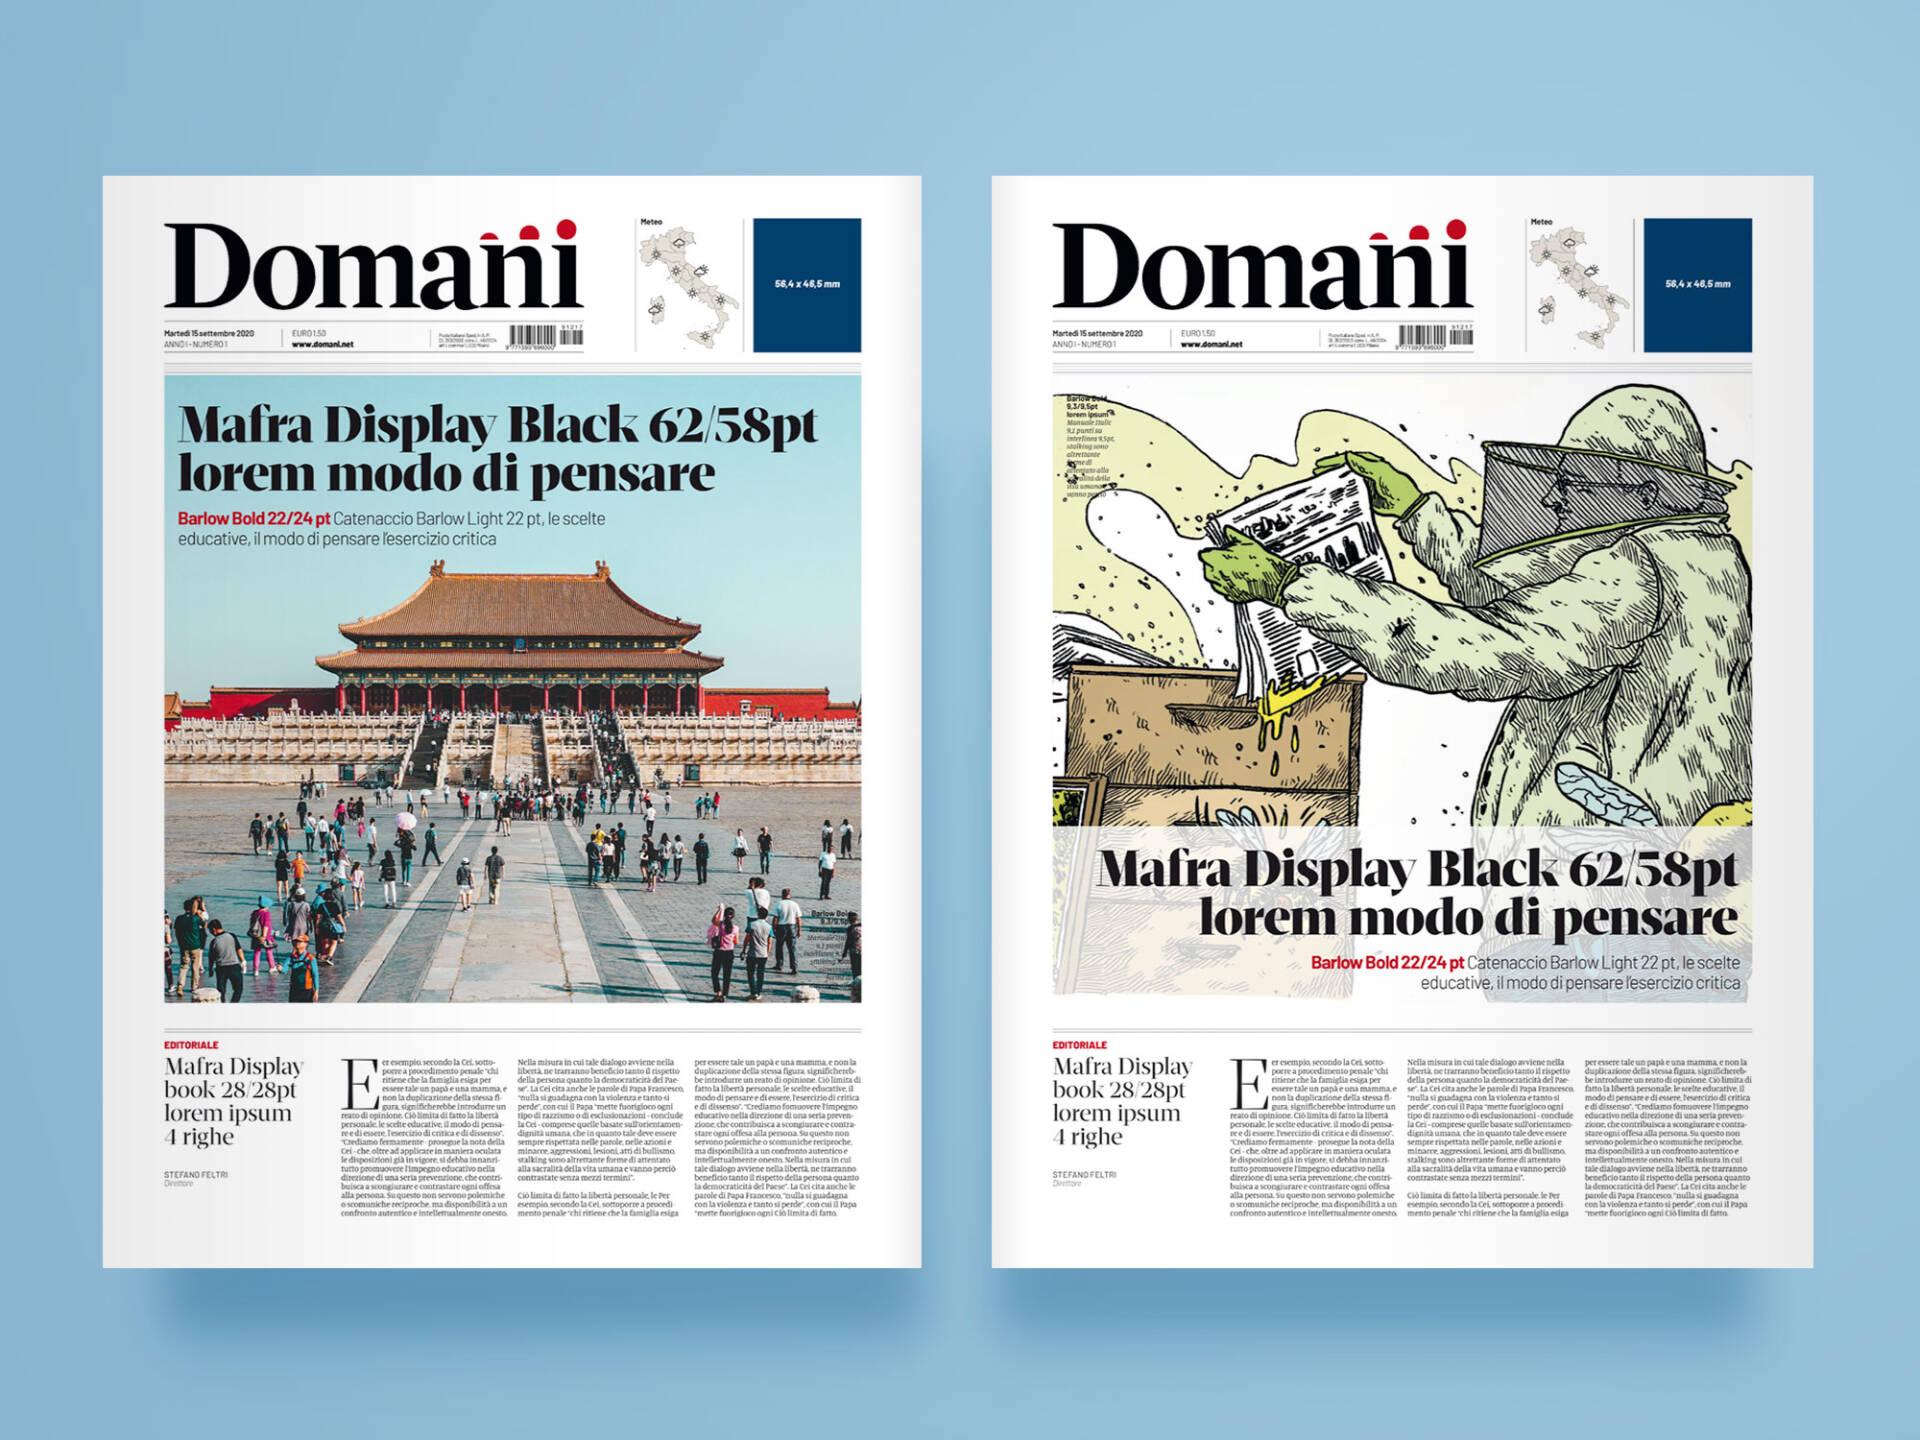 Domani_Print_Frontpage_Wenceslau_News_Design12